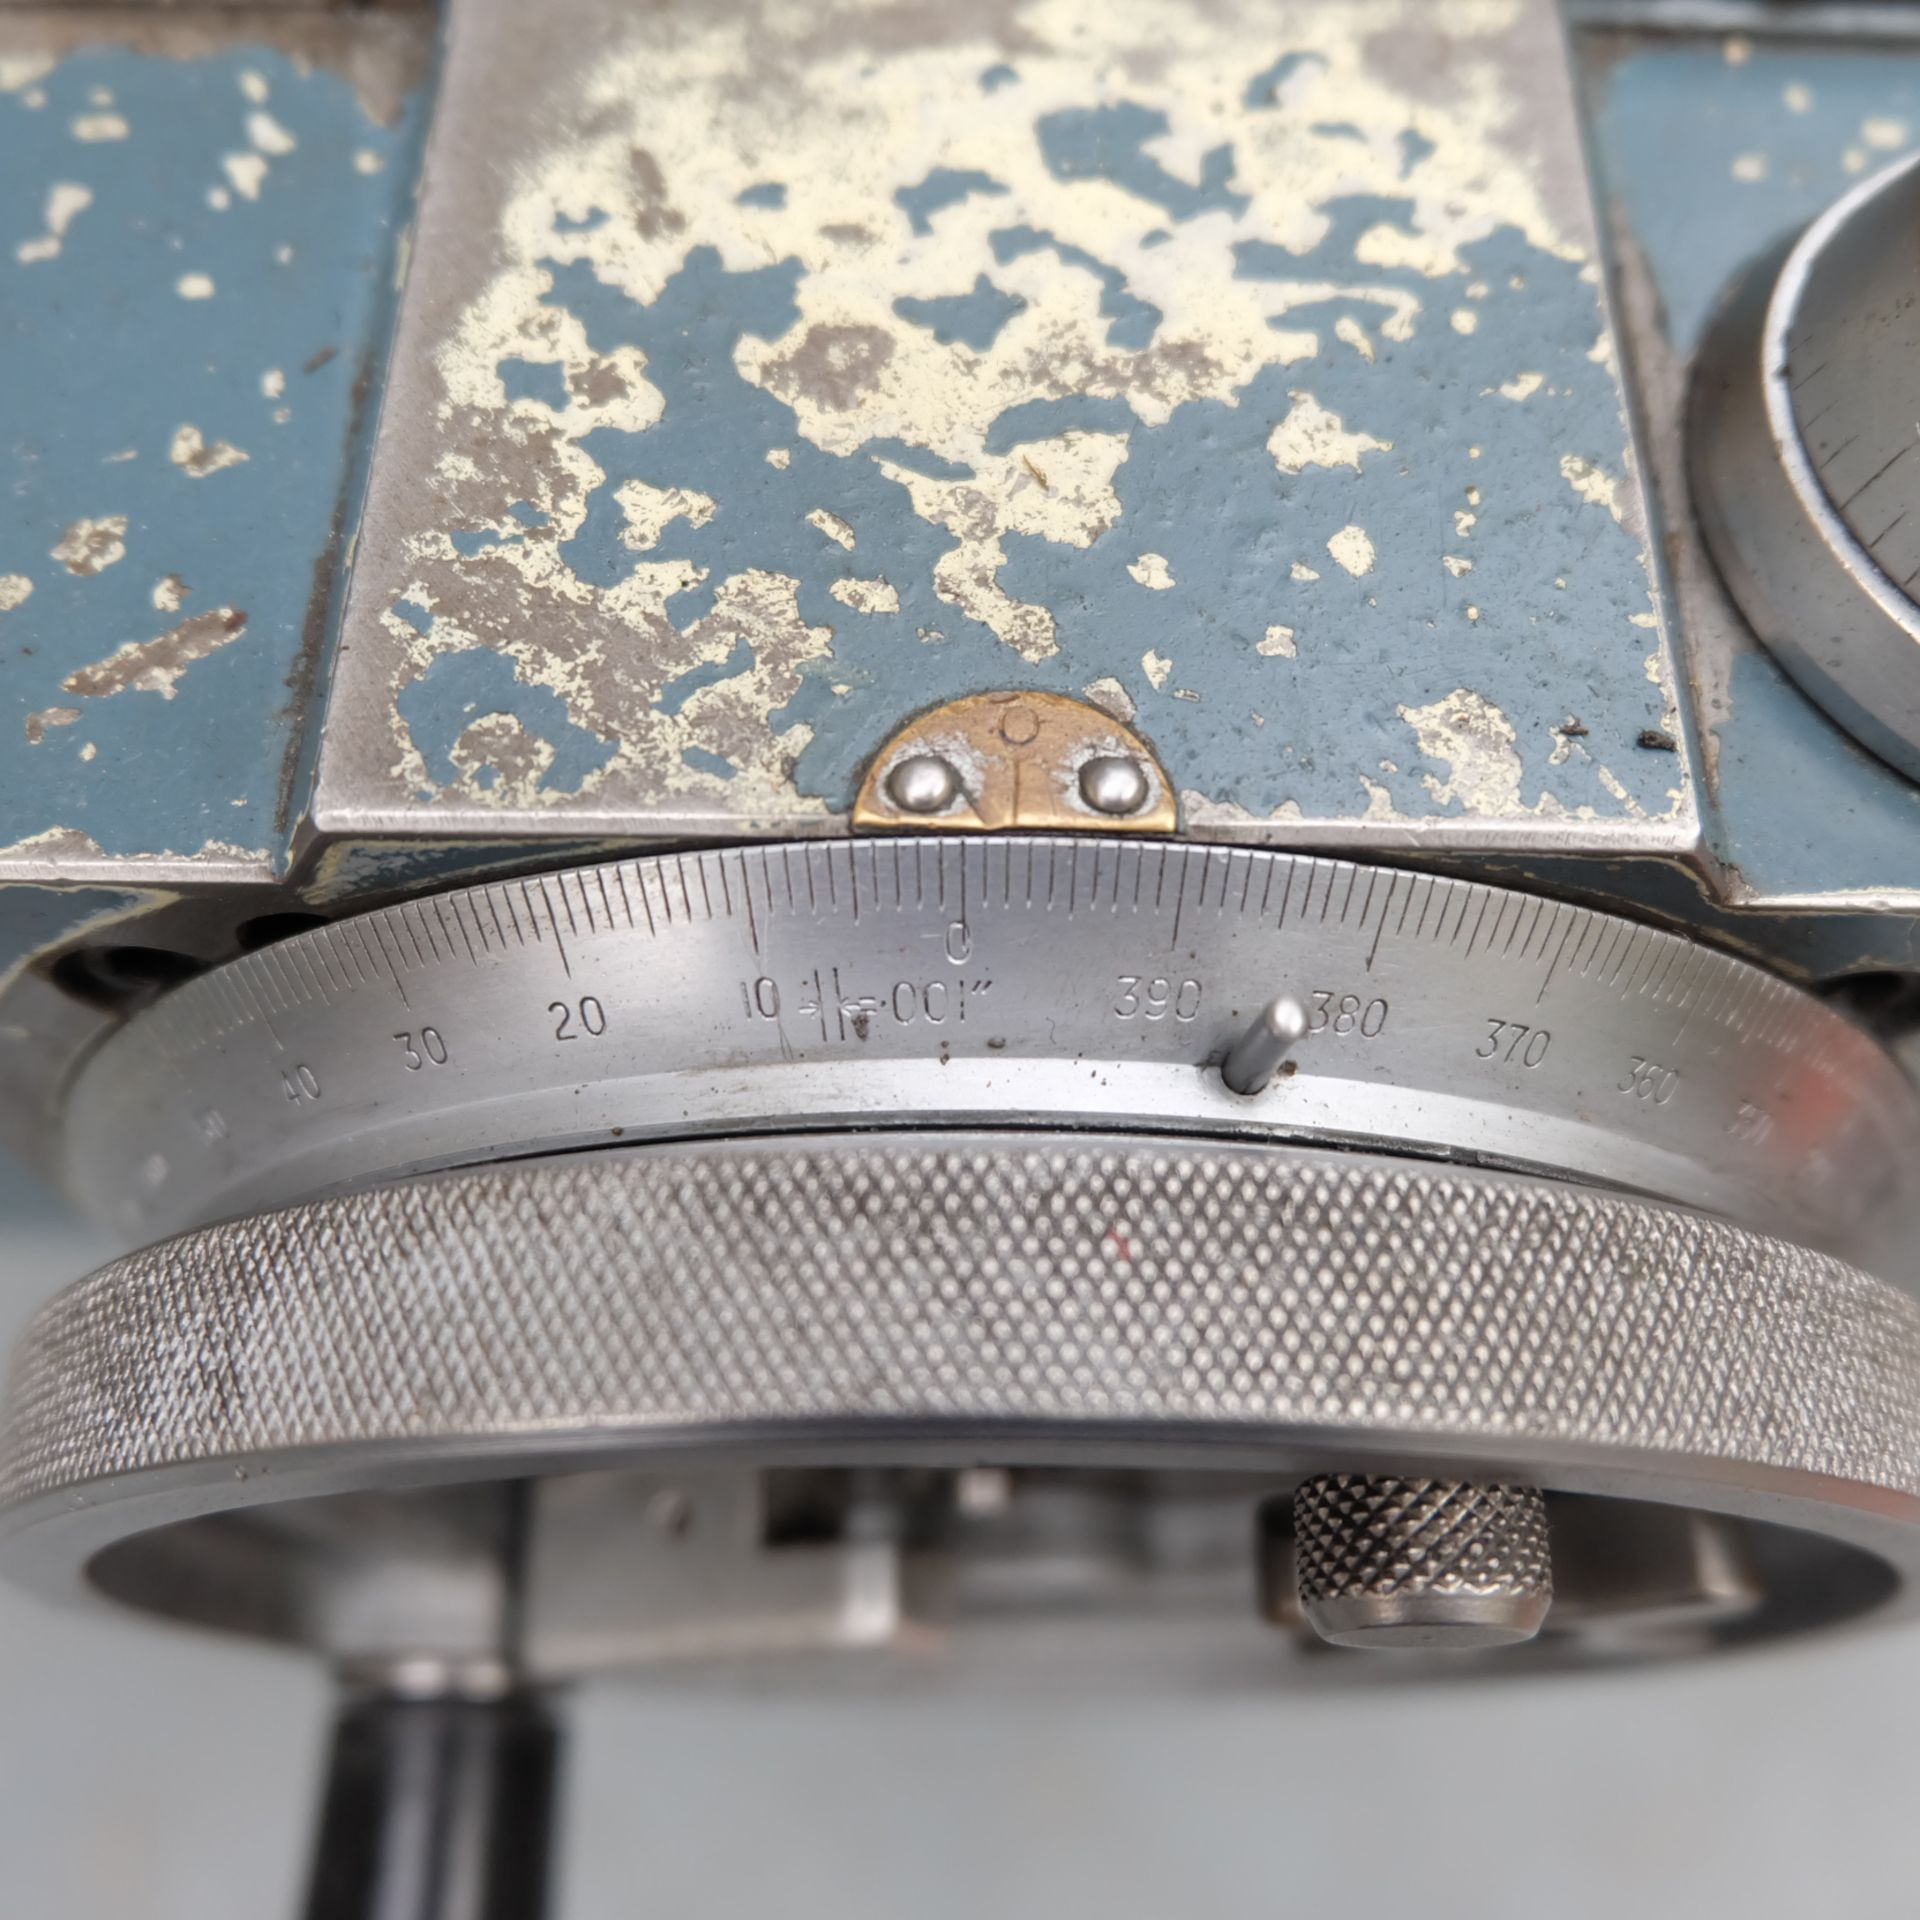 "Jones & Shipman 540 Surface Grinder. Capacity 18"" x 6"". Imperial Dials. - Image 7 of 8"